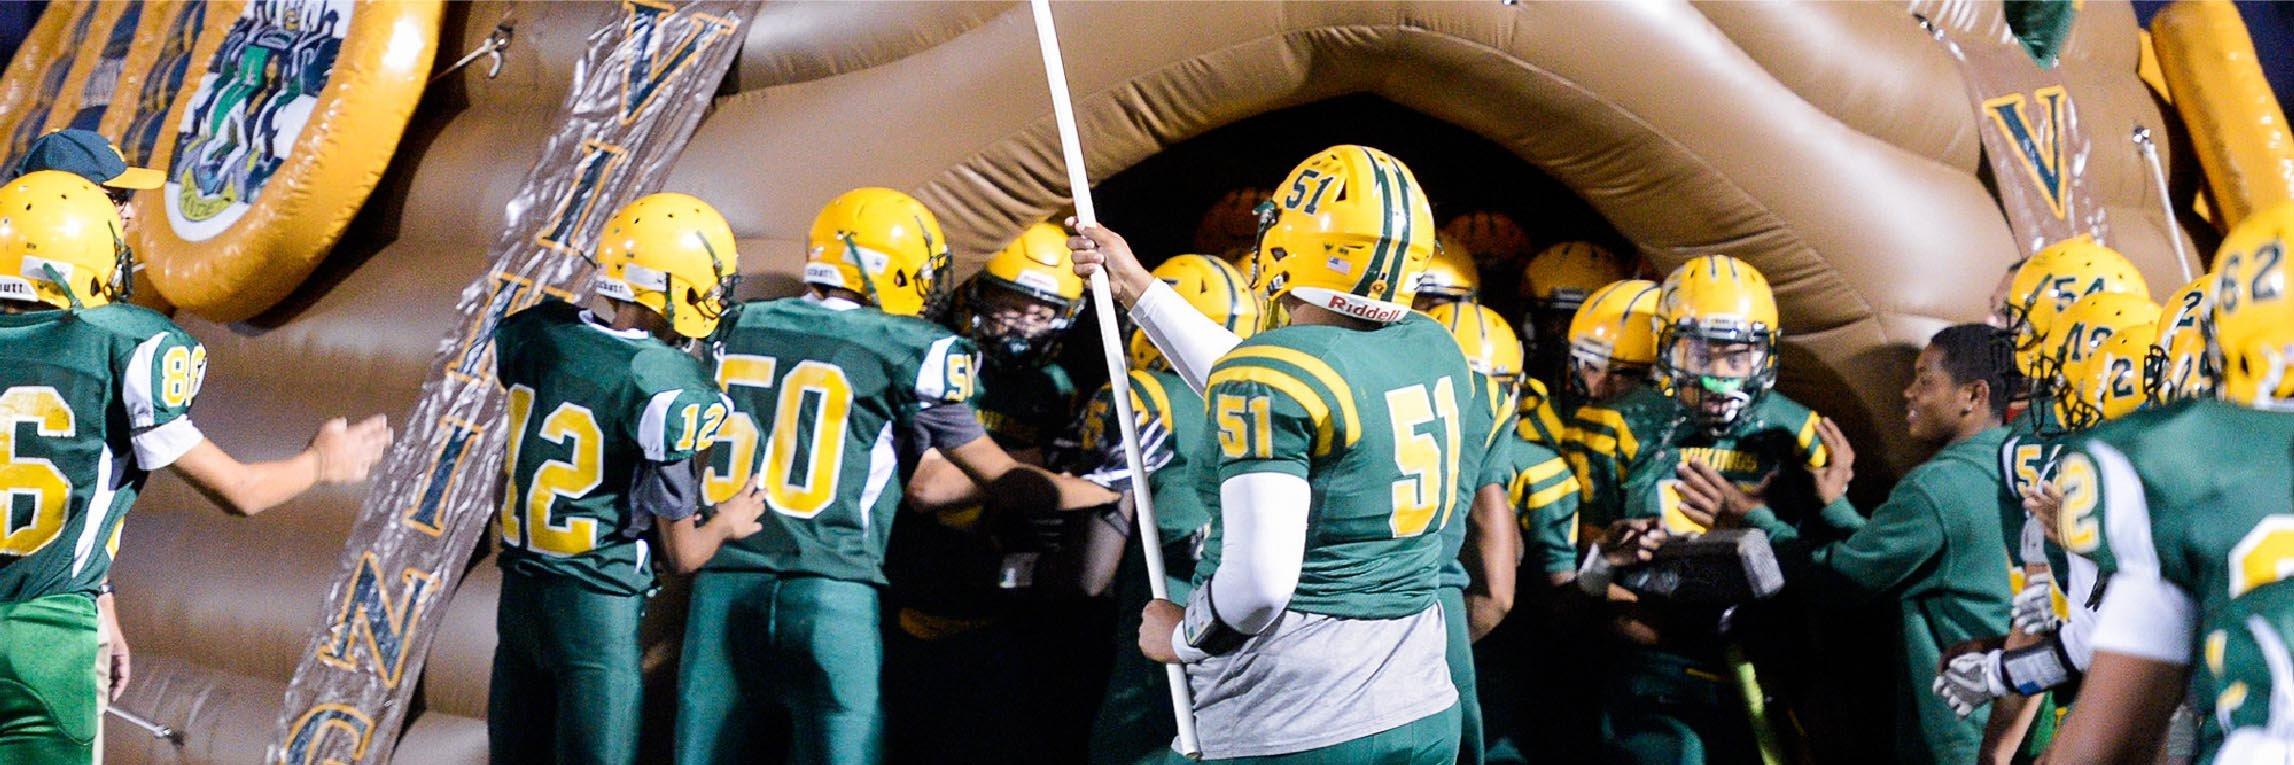 Vanden football team huddled around the custom tunnel